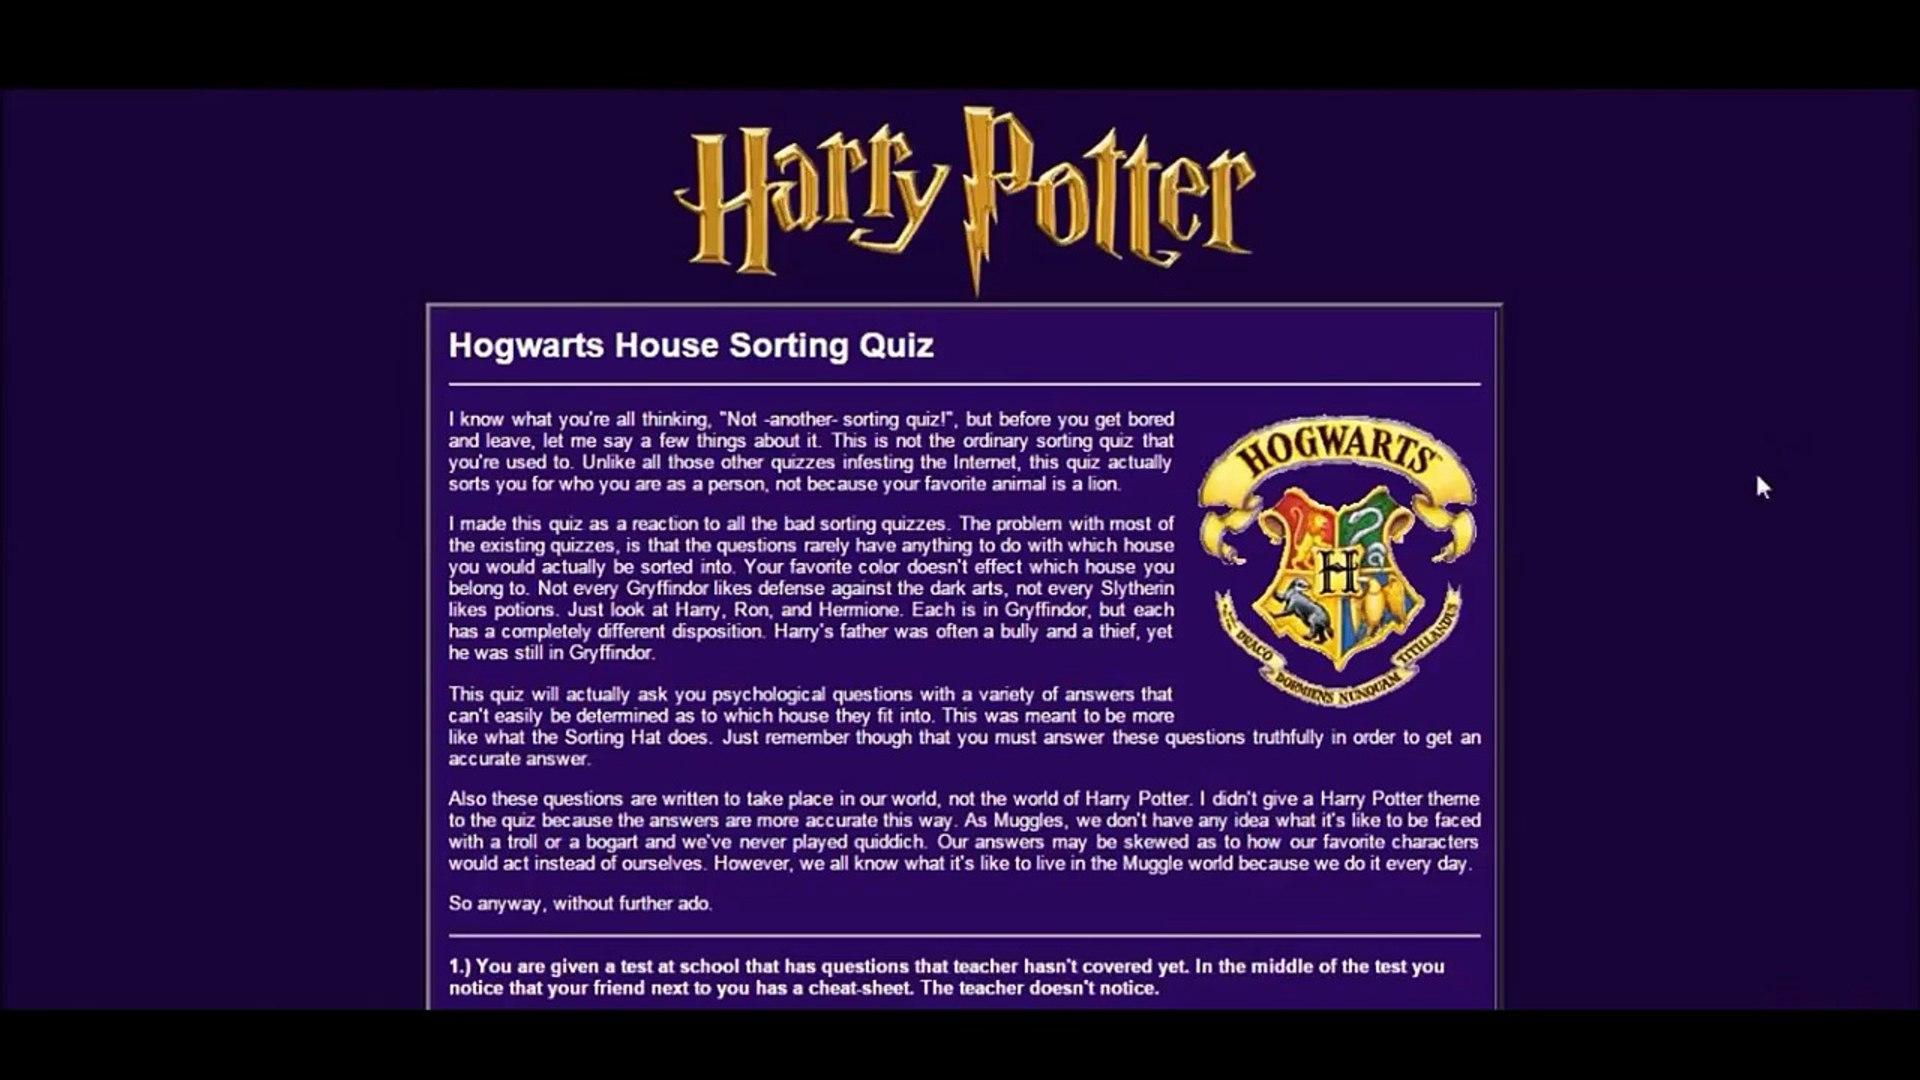 Let's Quiz #1 I AM A GENIUS! (Harry Potter House Sorting Quiz)